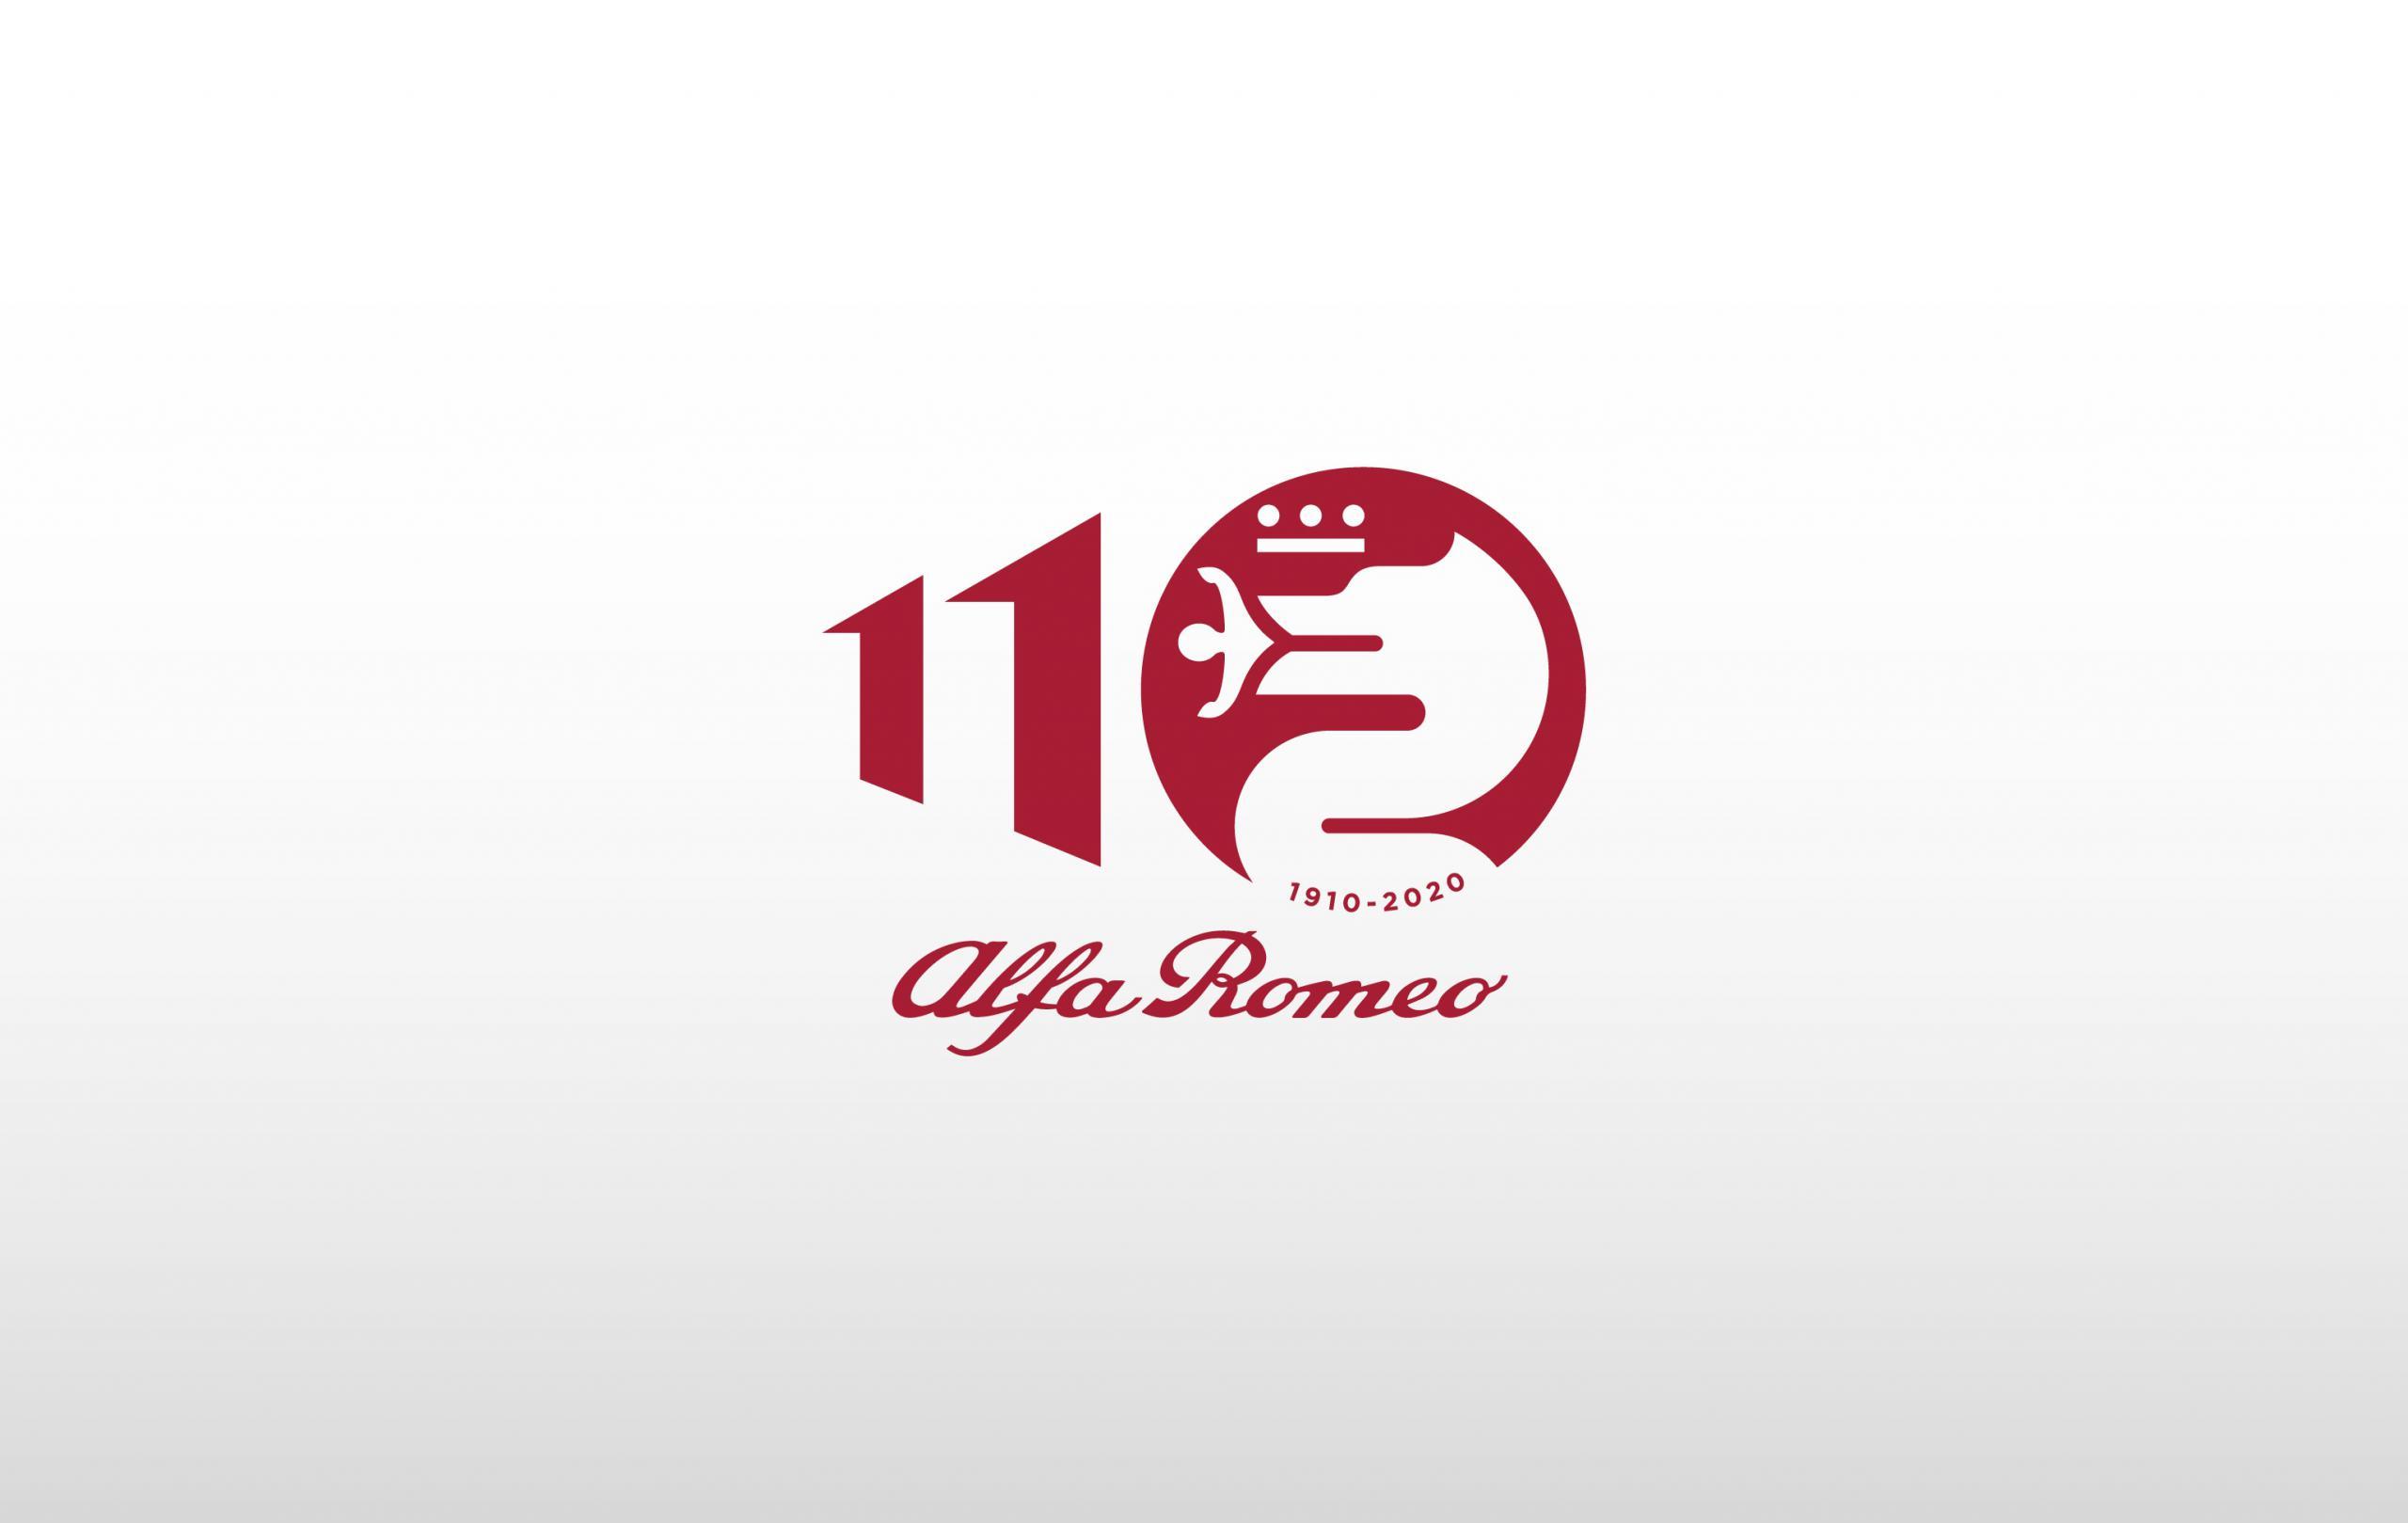 Alfa Romeo - 110 godina